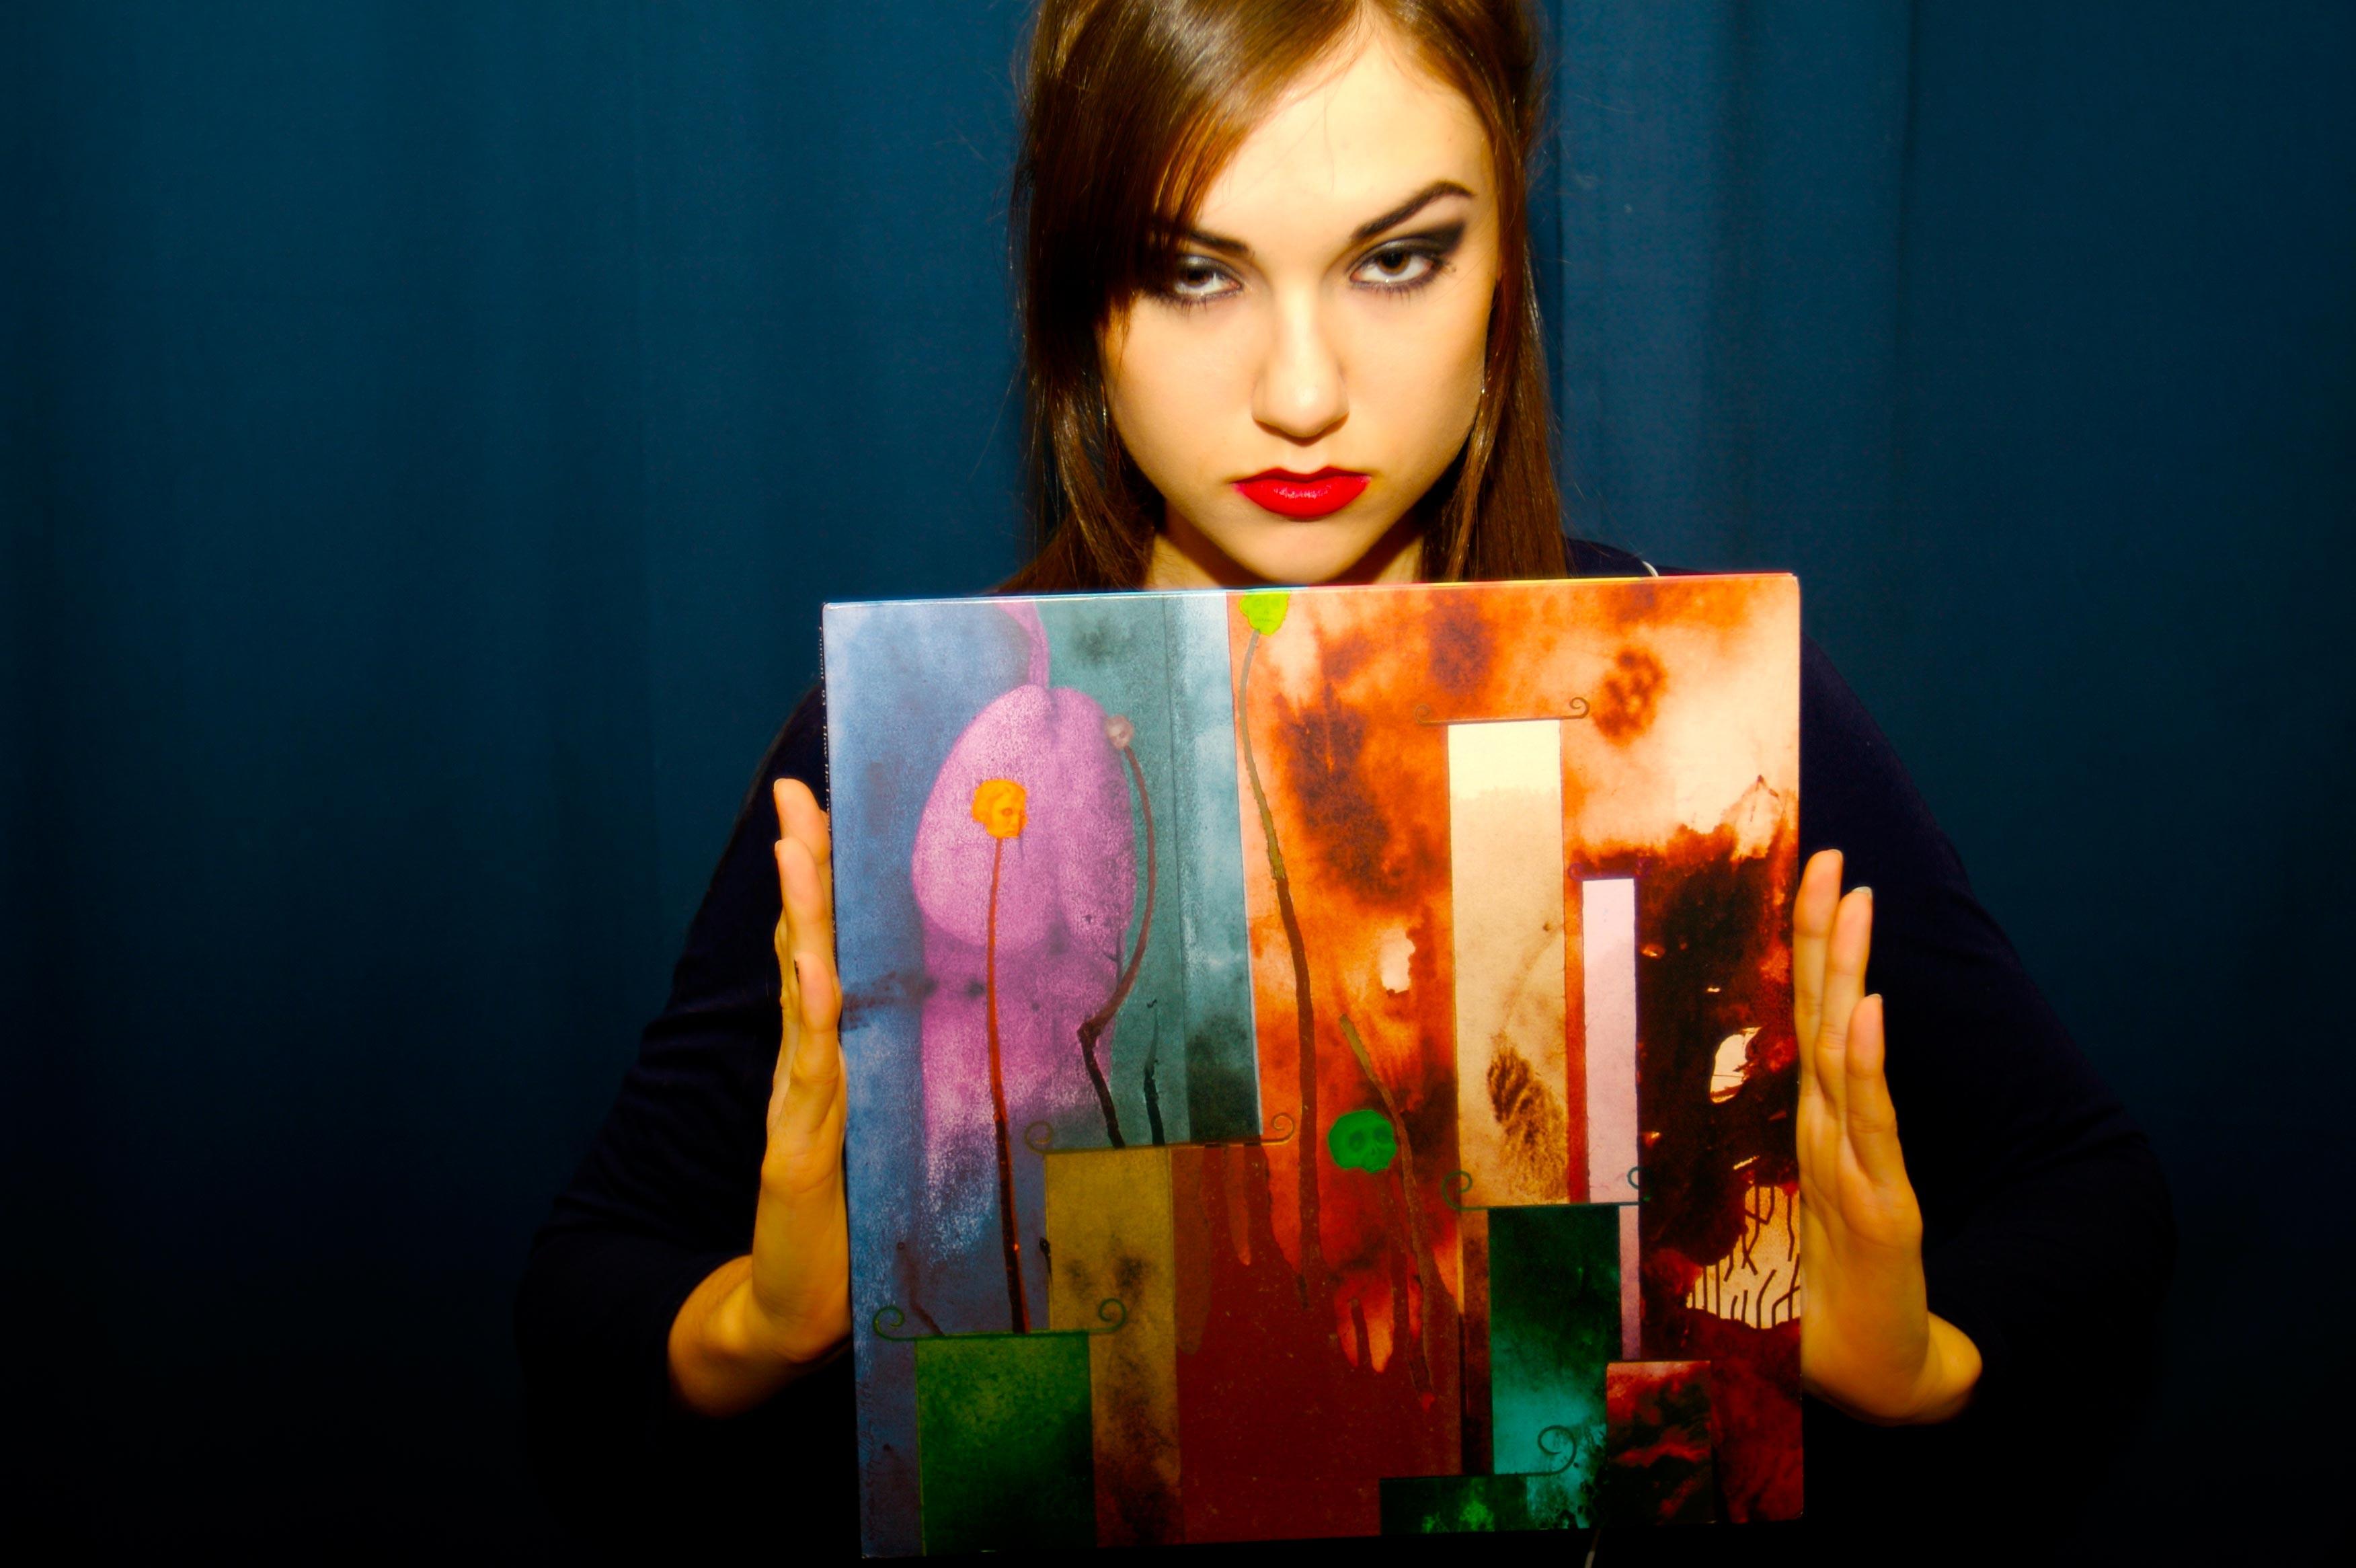 Wallpapers de Sasha Grey en HD [Muy Buenos] - Taringa!